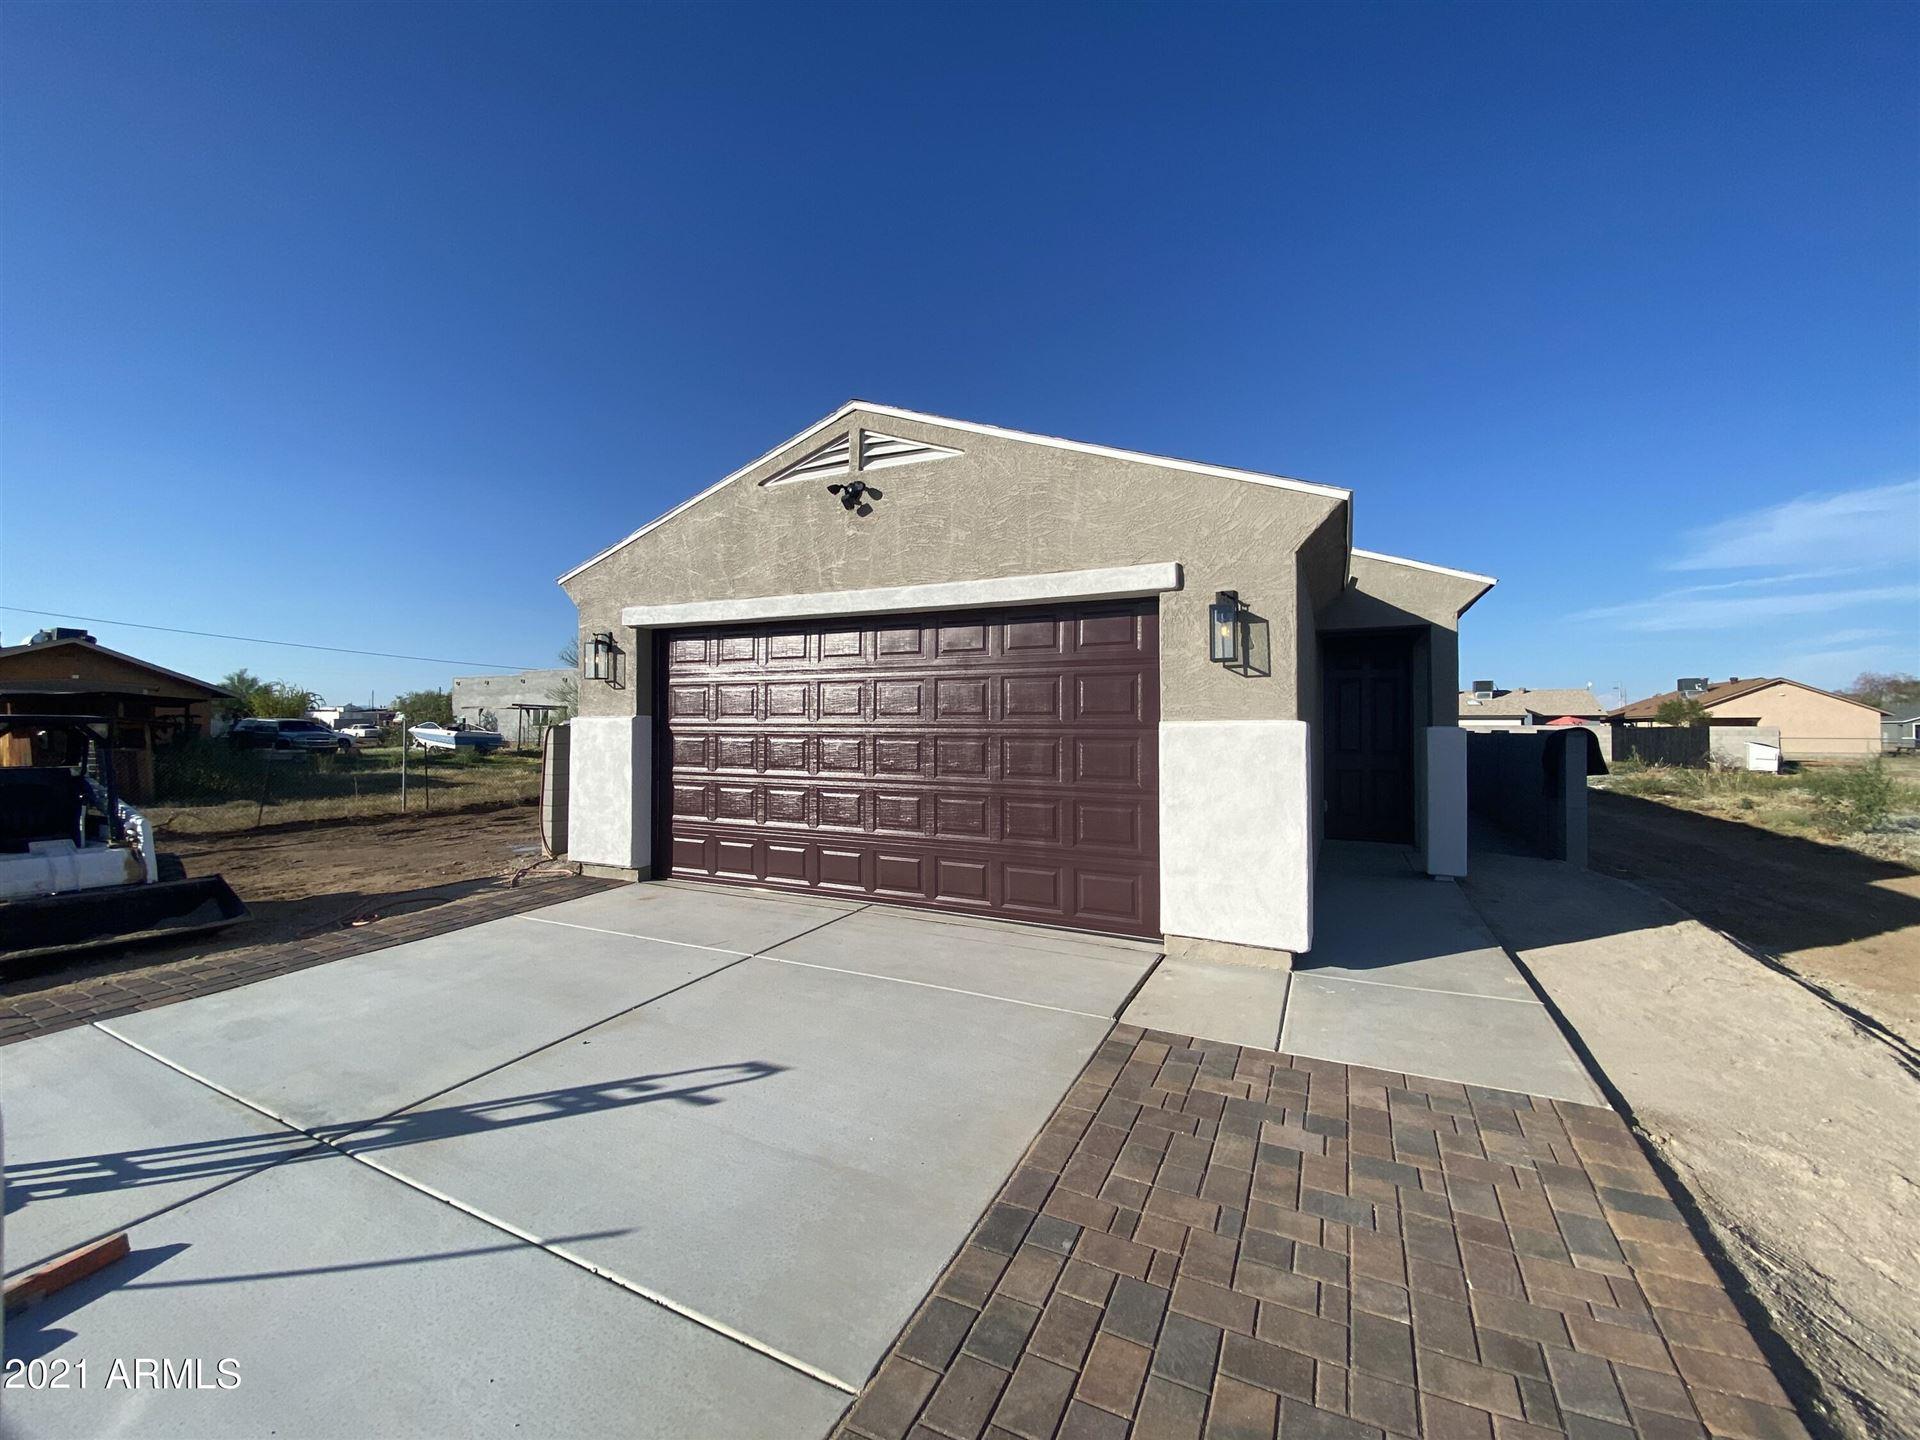 Photo of 21738 E TAFT Avenue, Wittmann, AZ 85361 (MLS # 6293174)